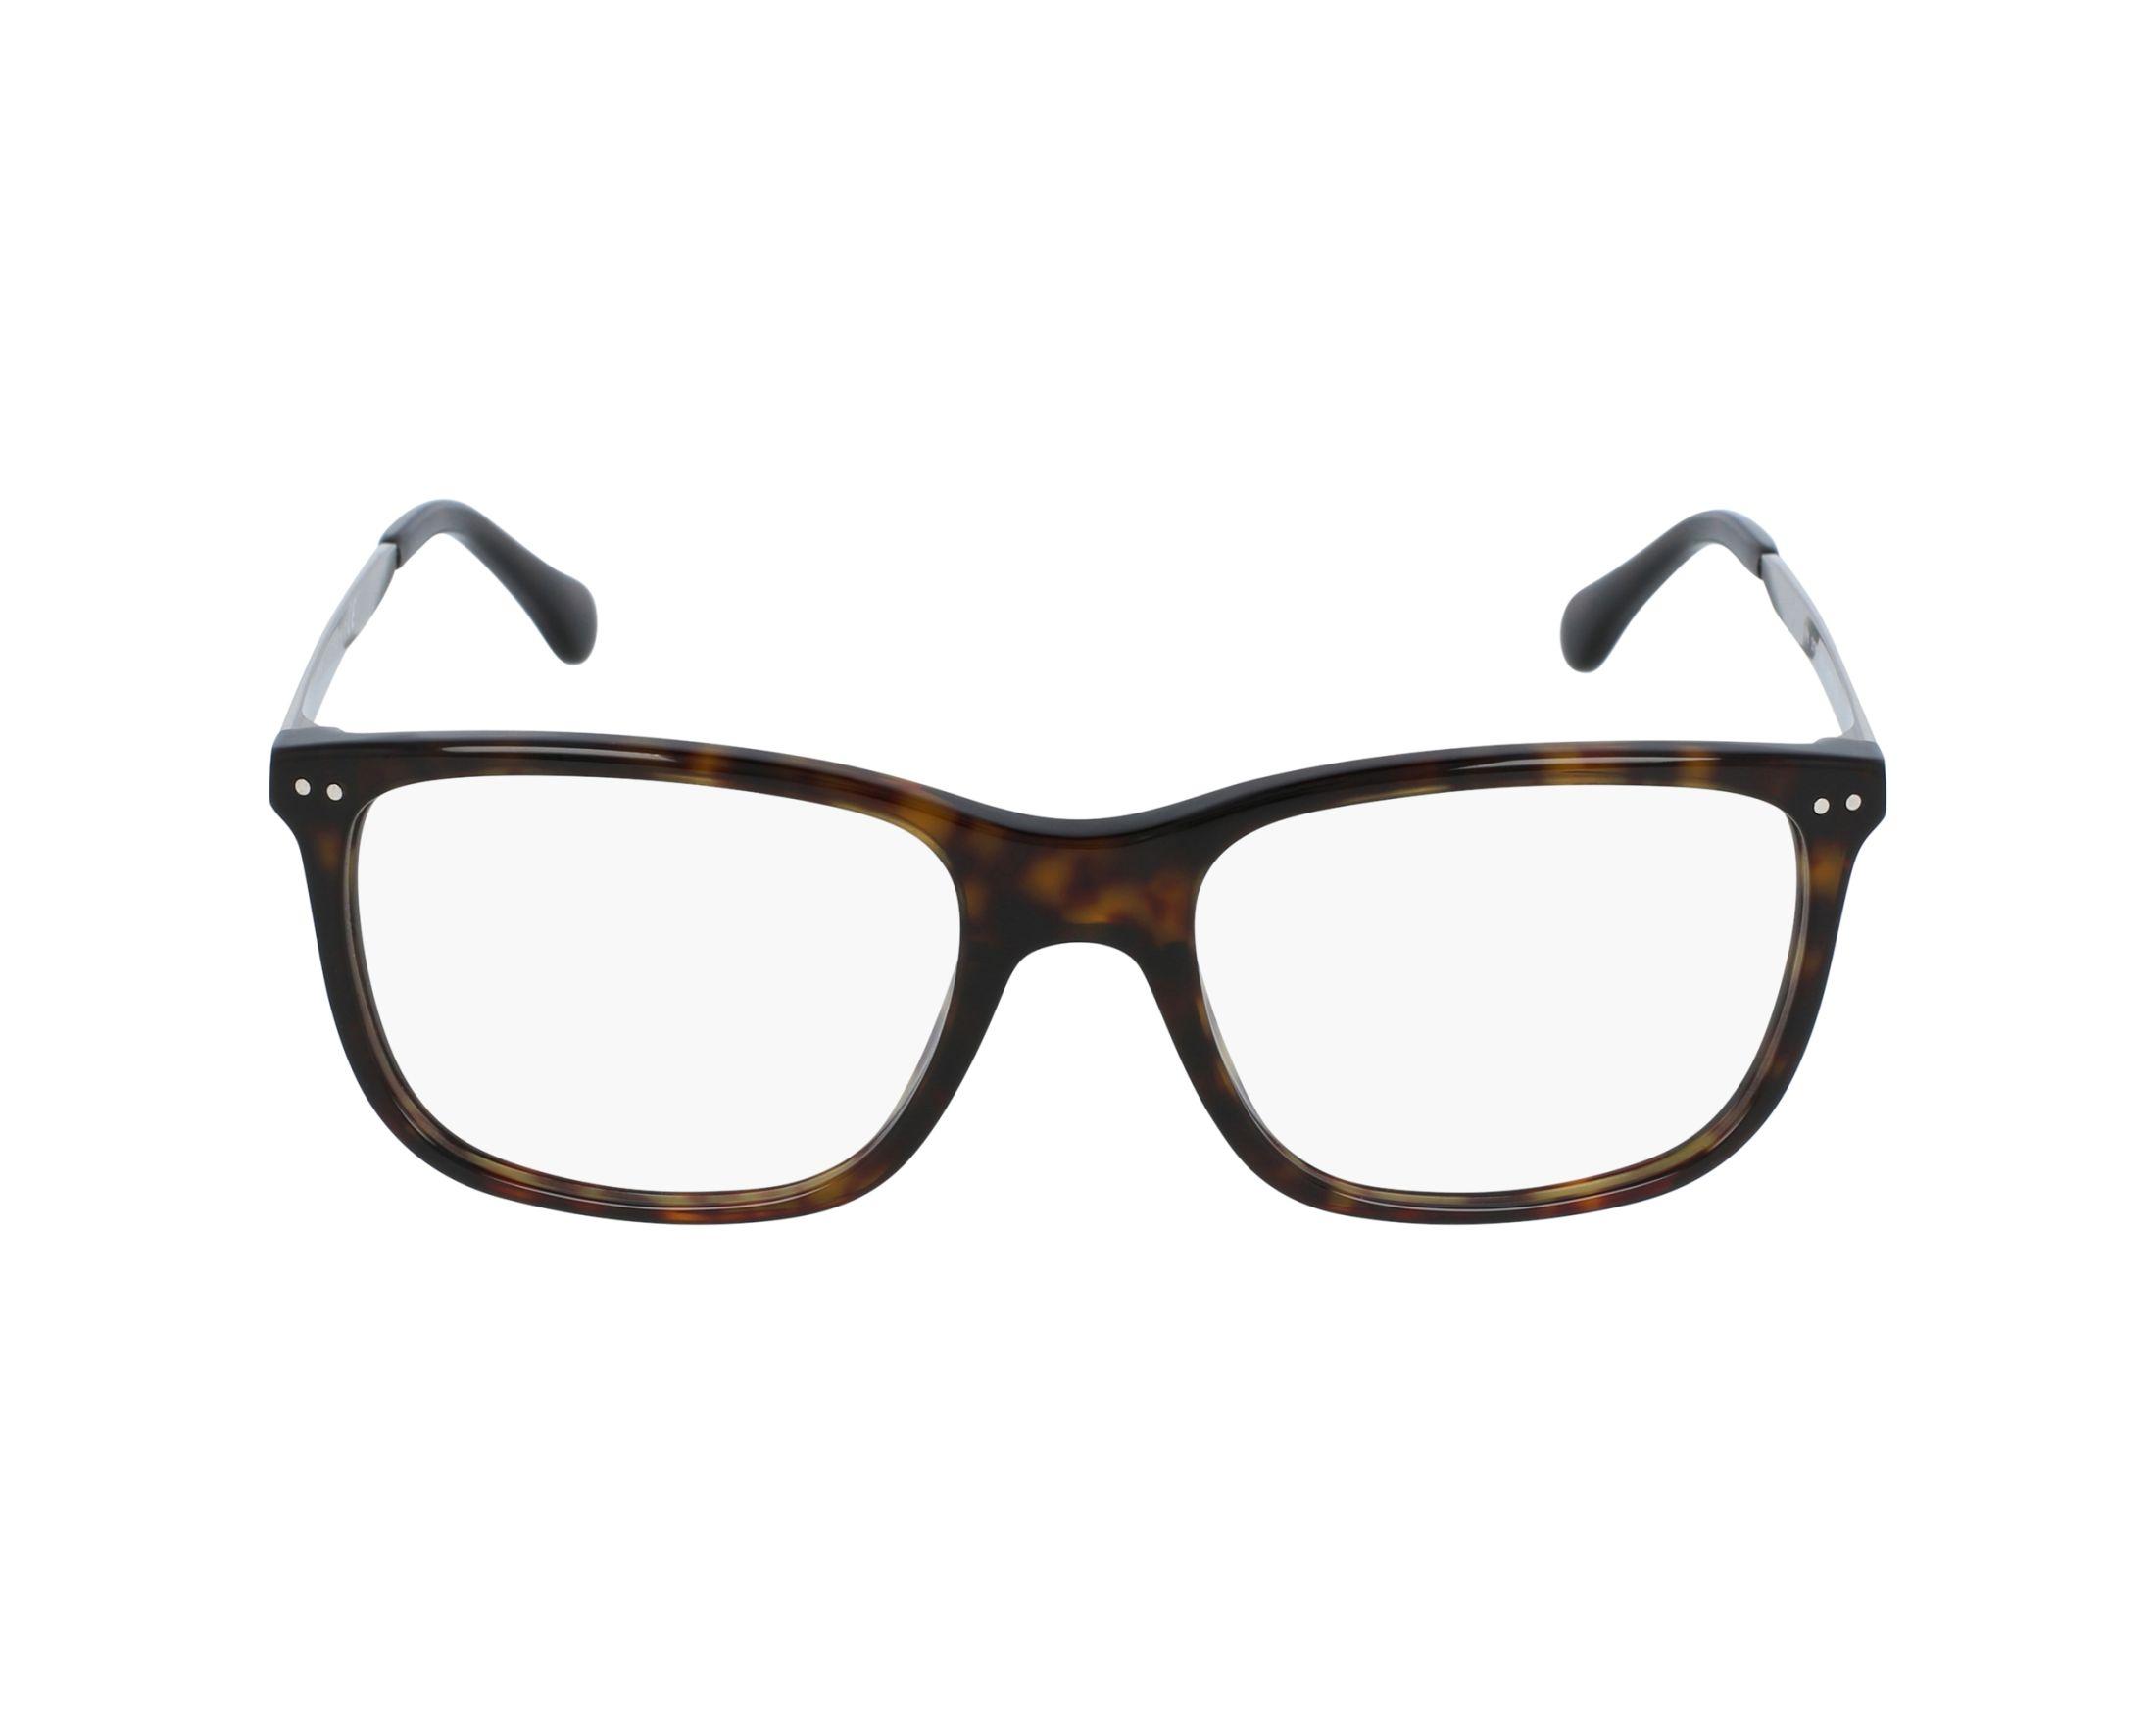 eyeglasses Polo Ralph Lauren PH-2171 5003 54-18 Havana Silver profile view